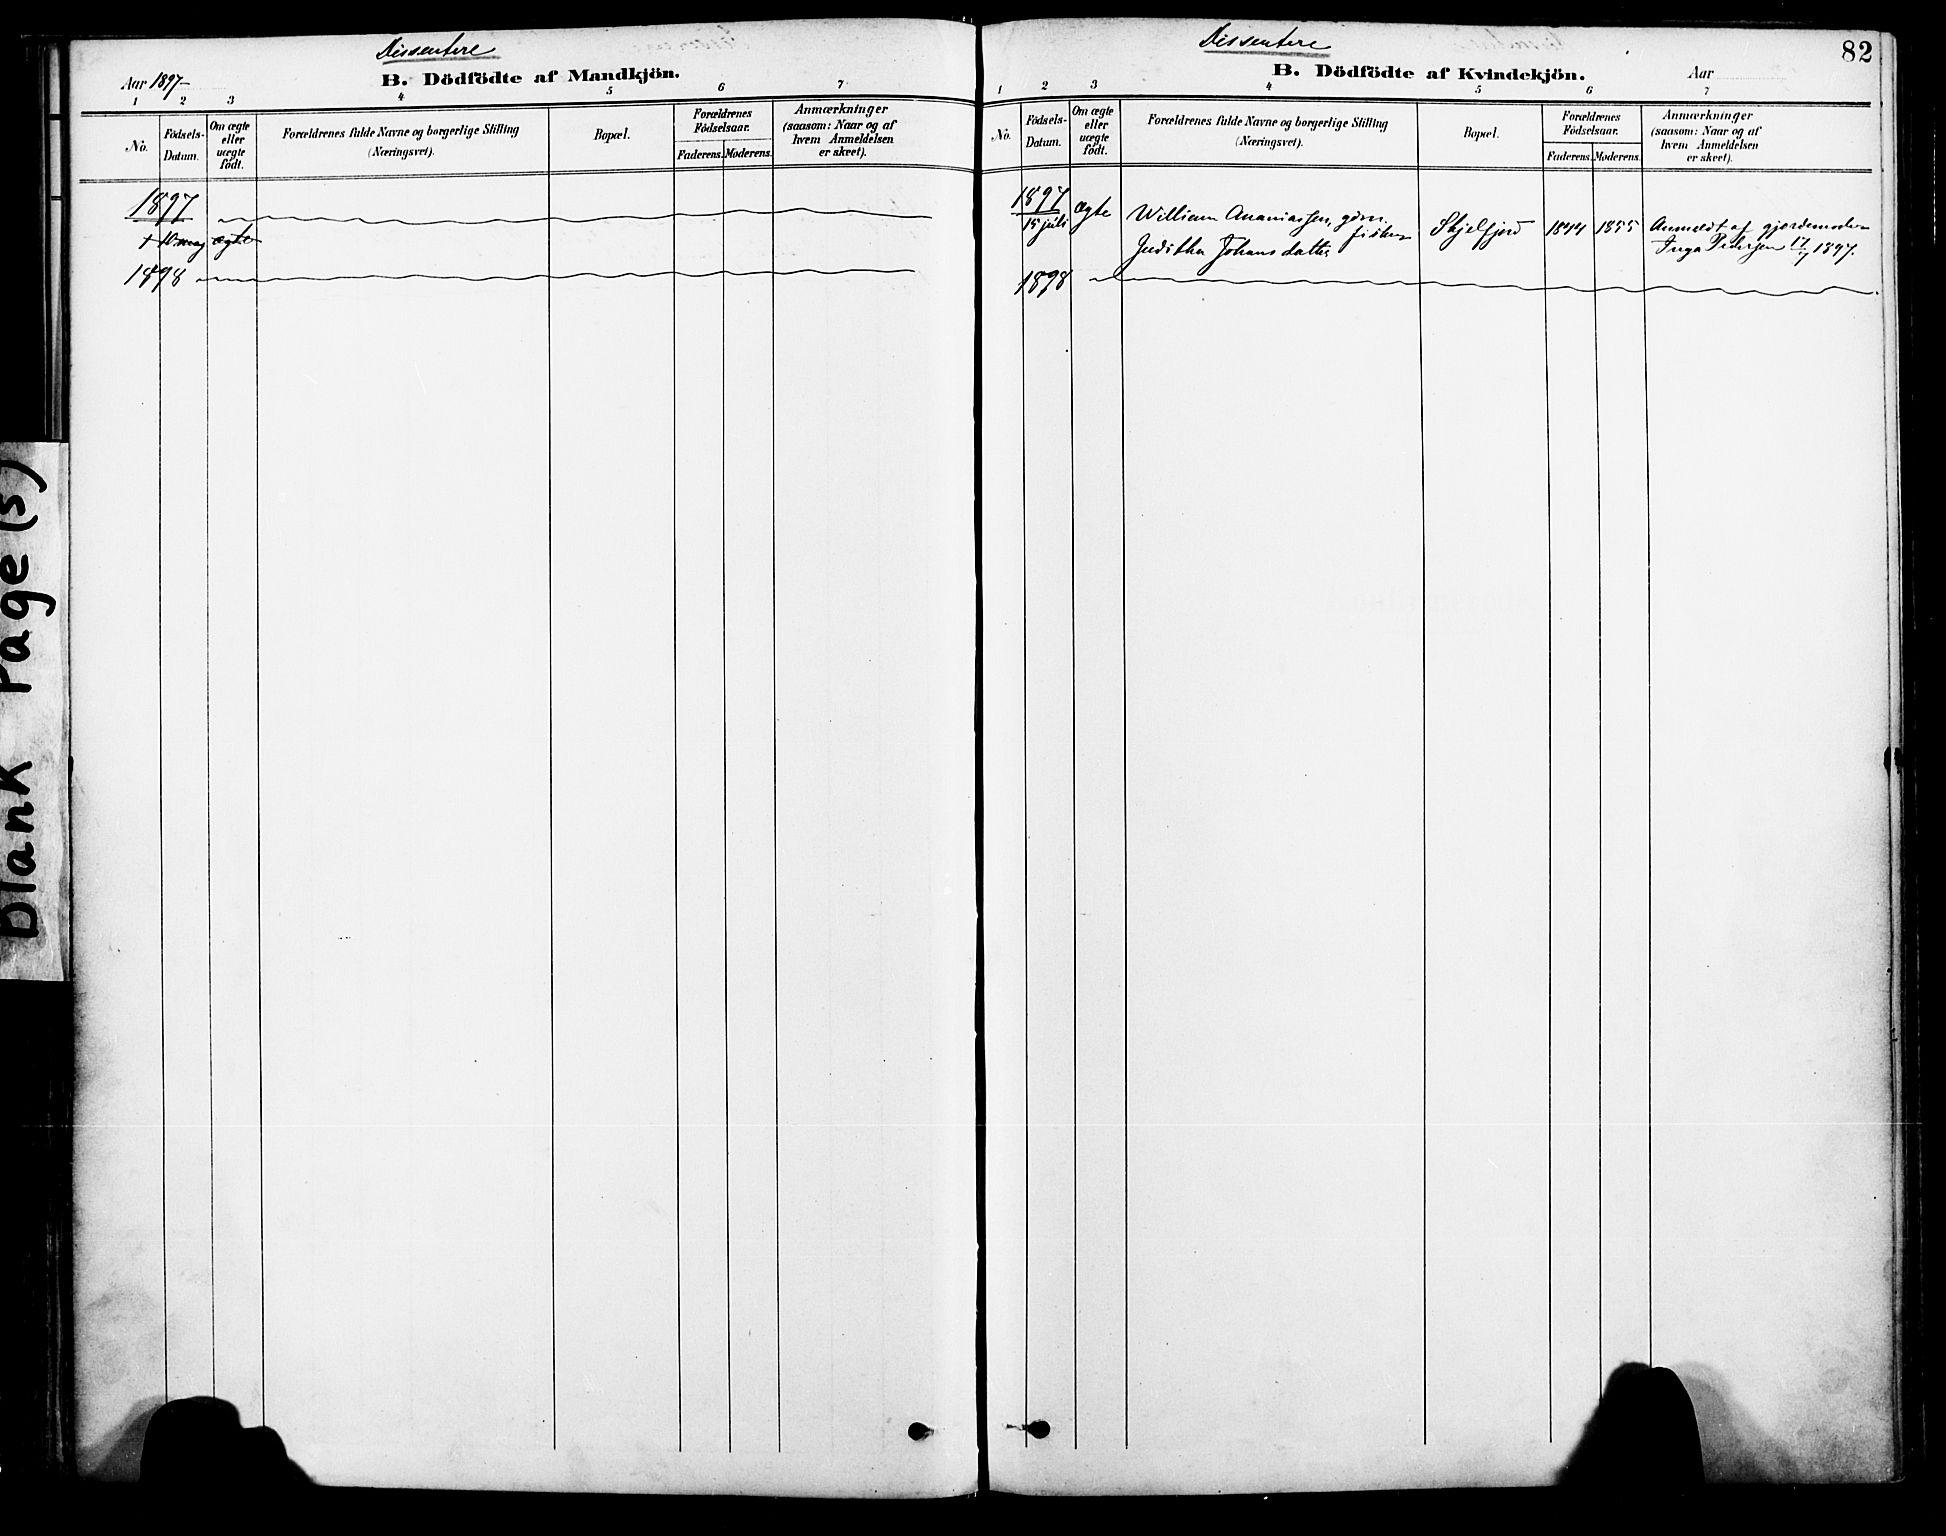 SAT, Ministerialprotokoller, klokkerbøker og fødselsregistre - Nordland, 885/L1205: Ministerialbok nr. 885A06, 1892-1905, s. 82